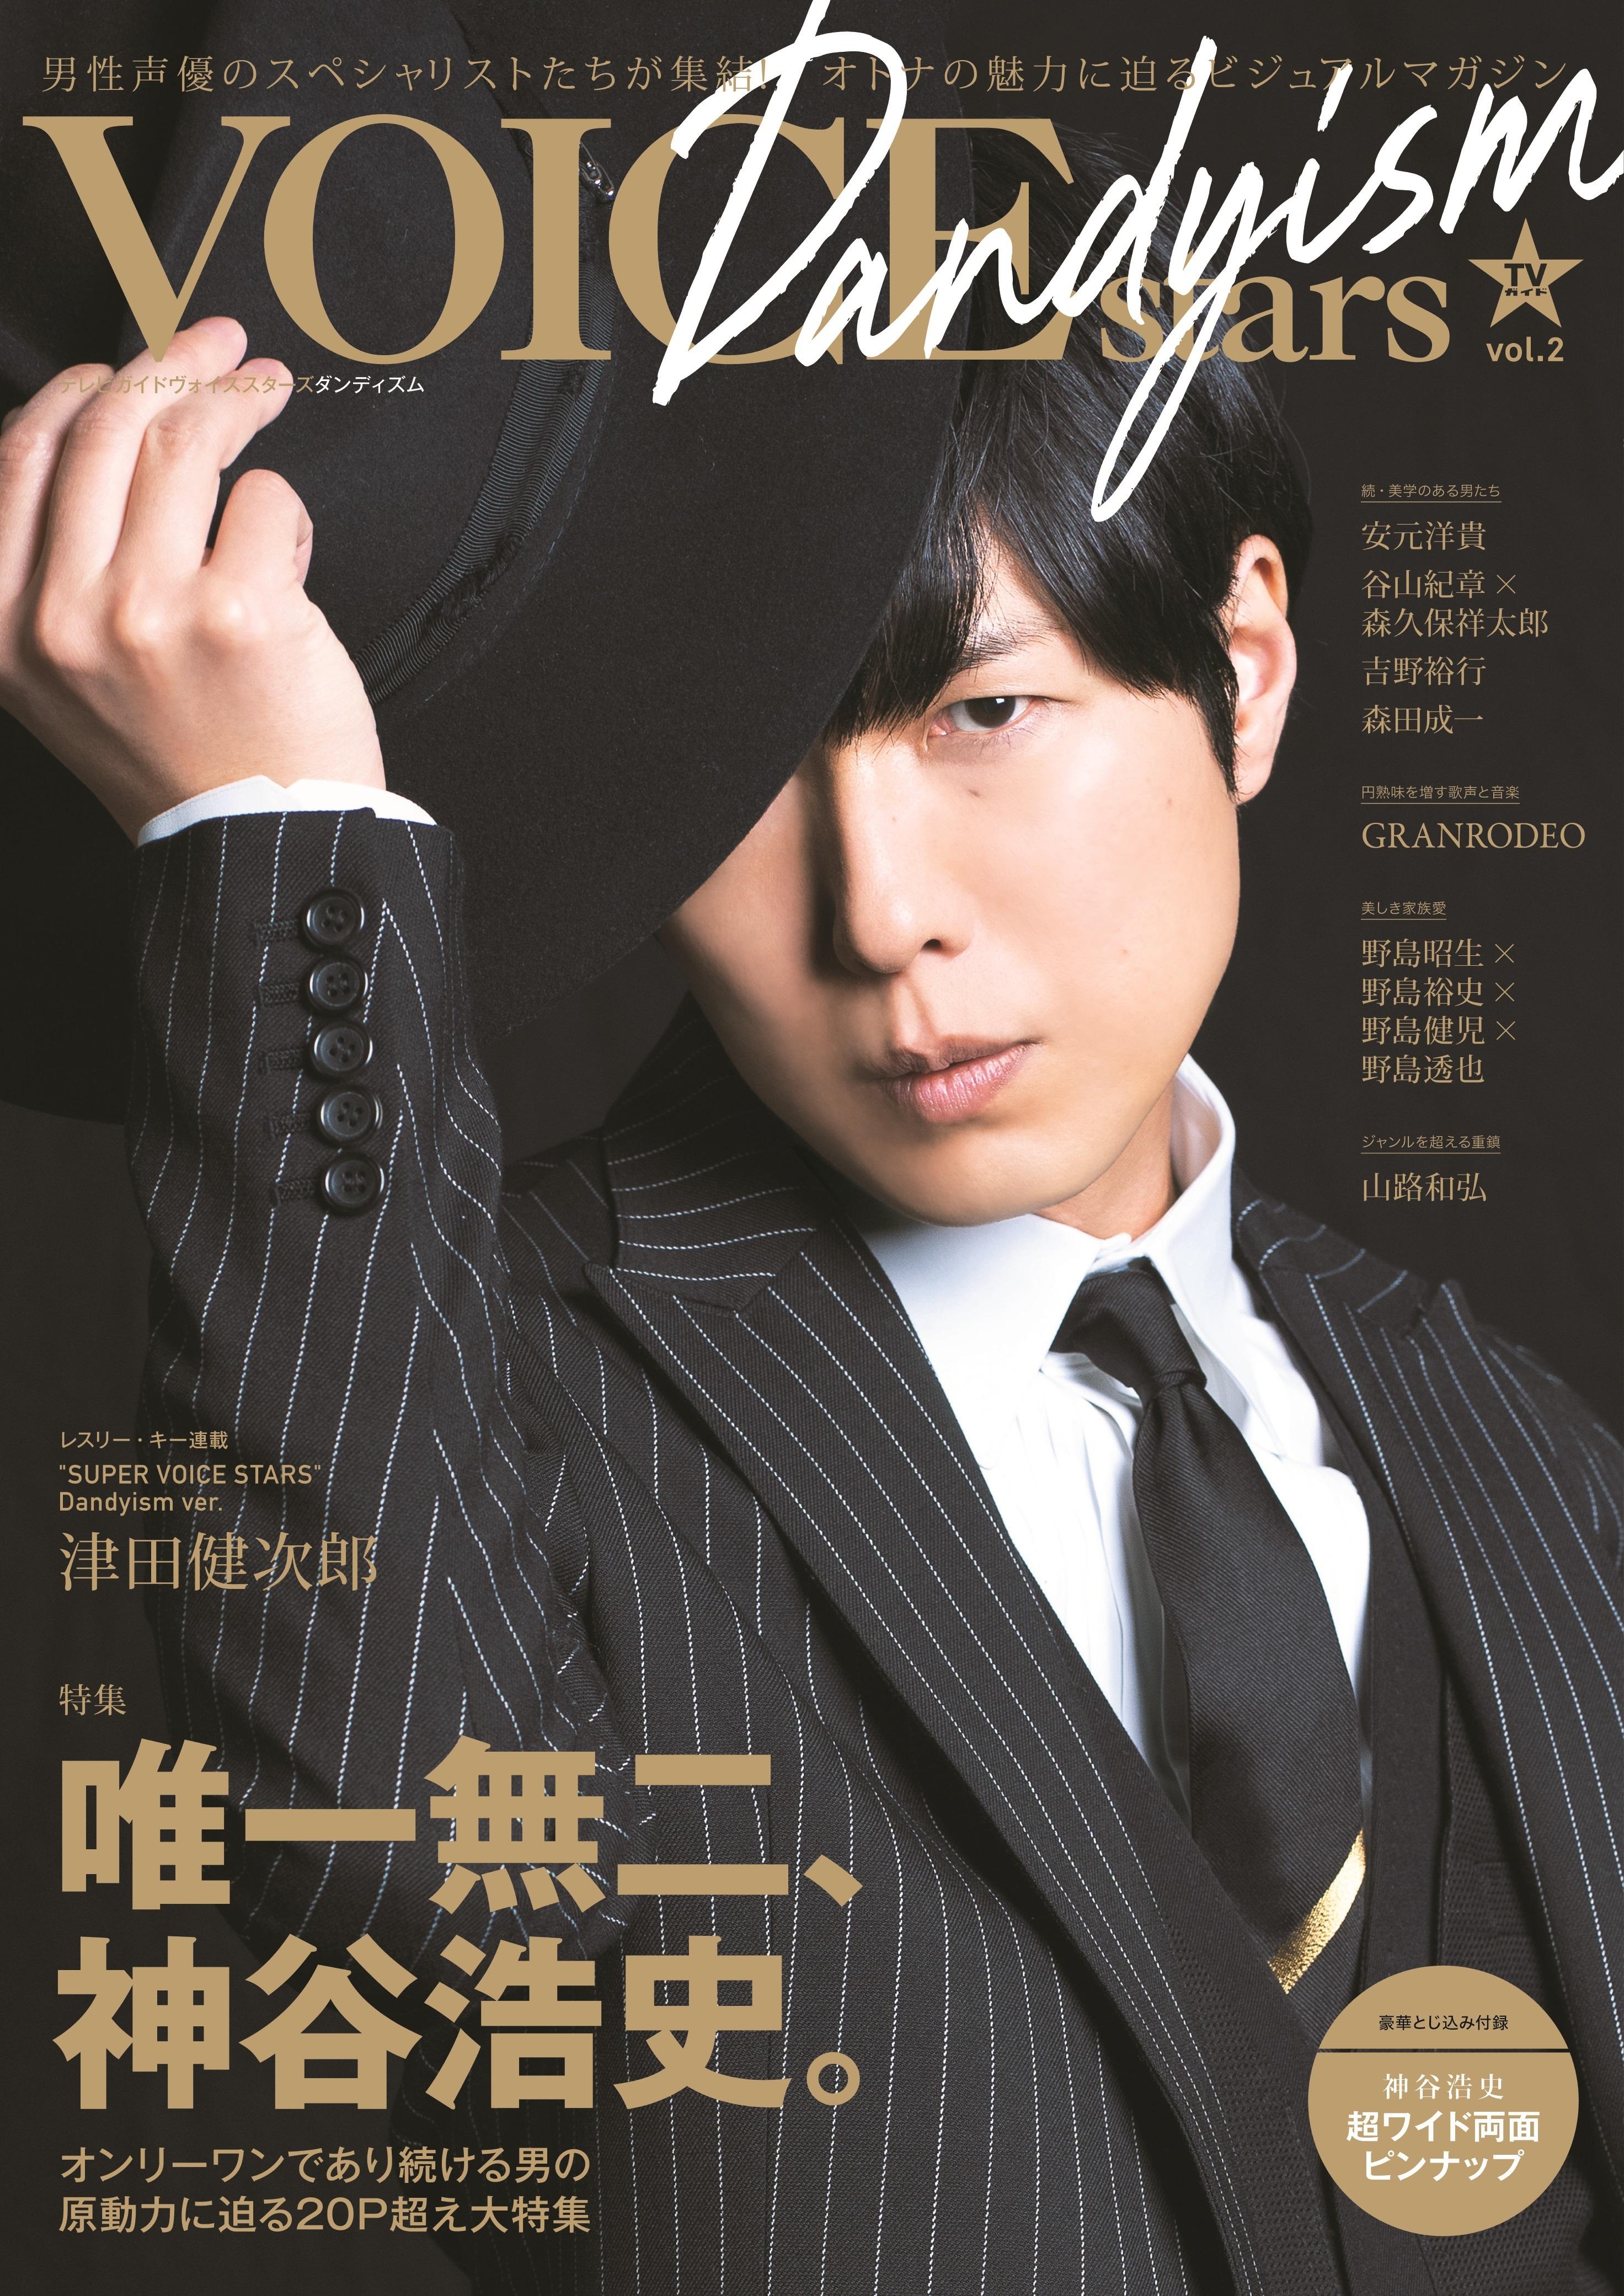 Amazon限定表紙版 「TVガイドVOICE STARS Dandyism vol.2」(東京ニュース通信社刊)